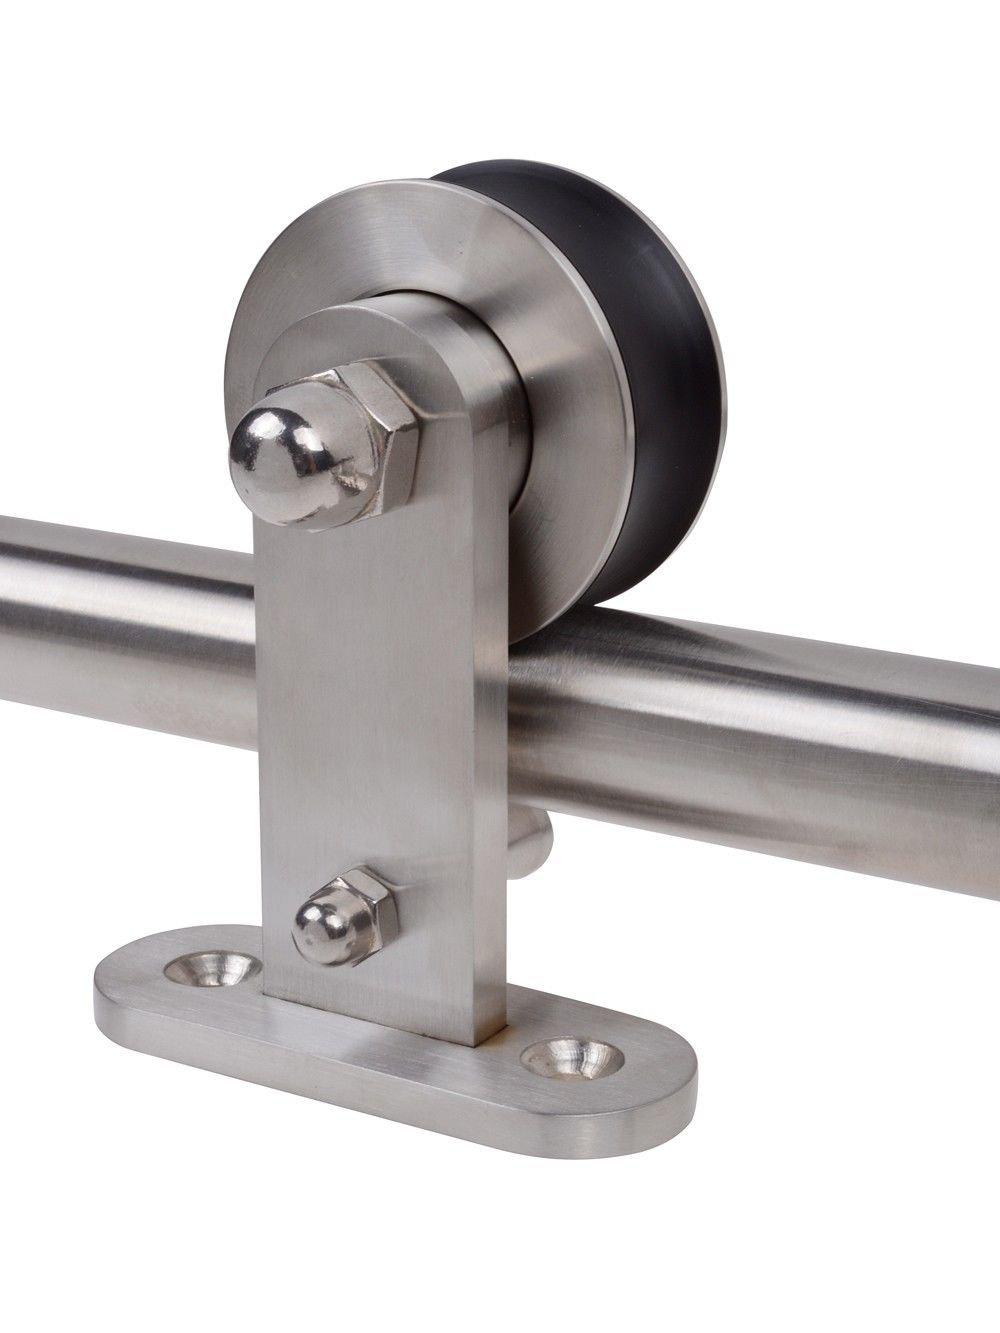 6.6 FT Stainless Steel Interior Sliding Barn Wood Door Hardware Set W/Handle